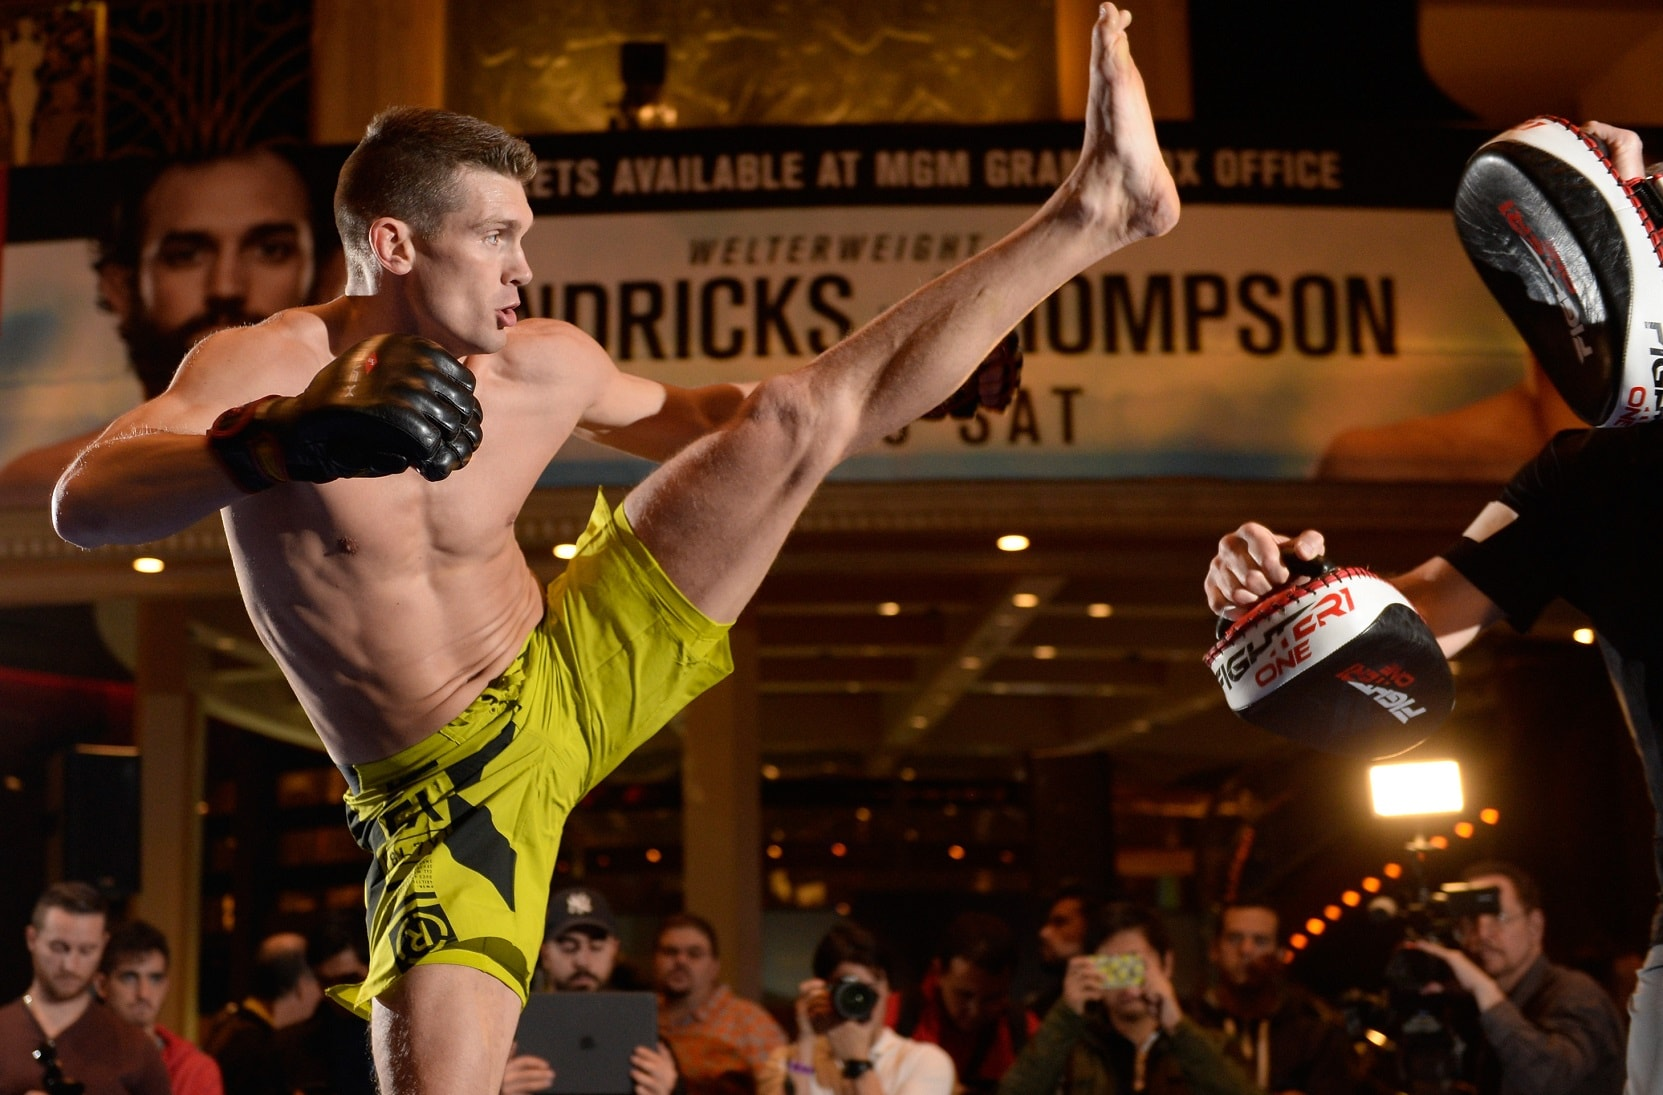 Стивен Рэндалл – боец UFC: биография, статистика и лучшие бои